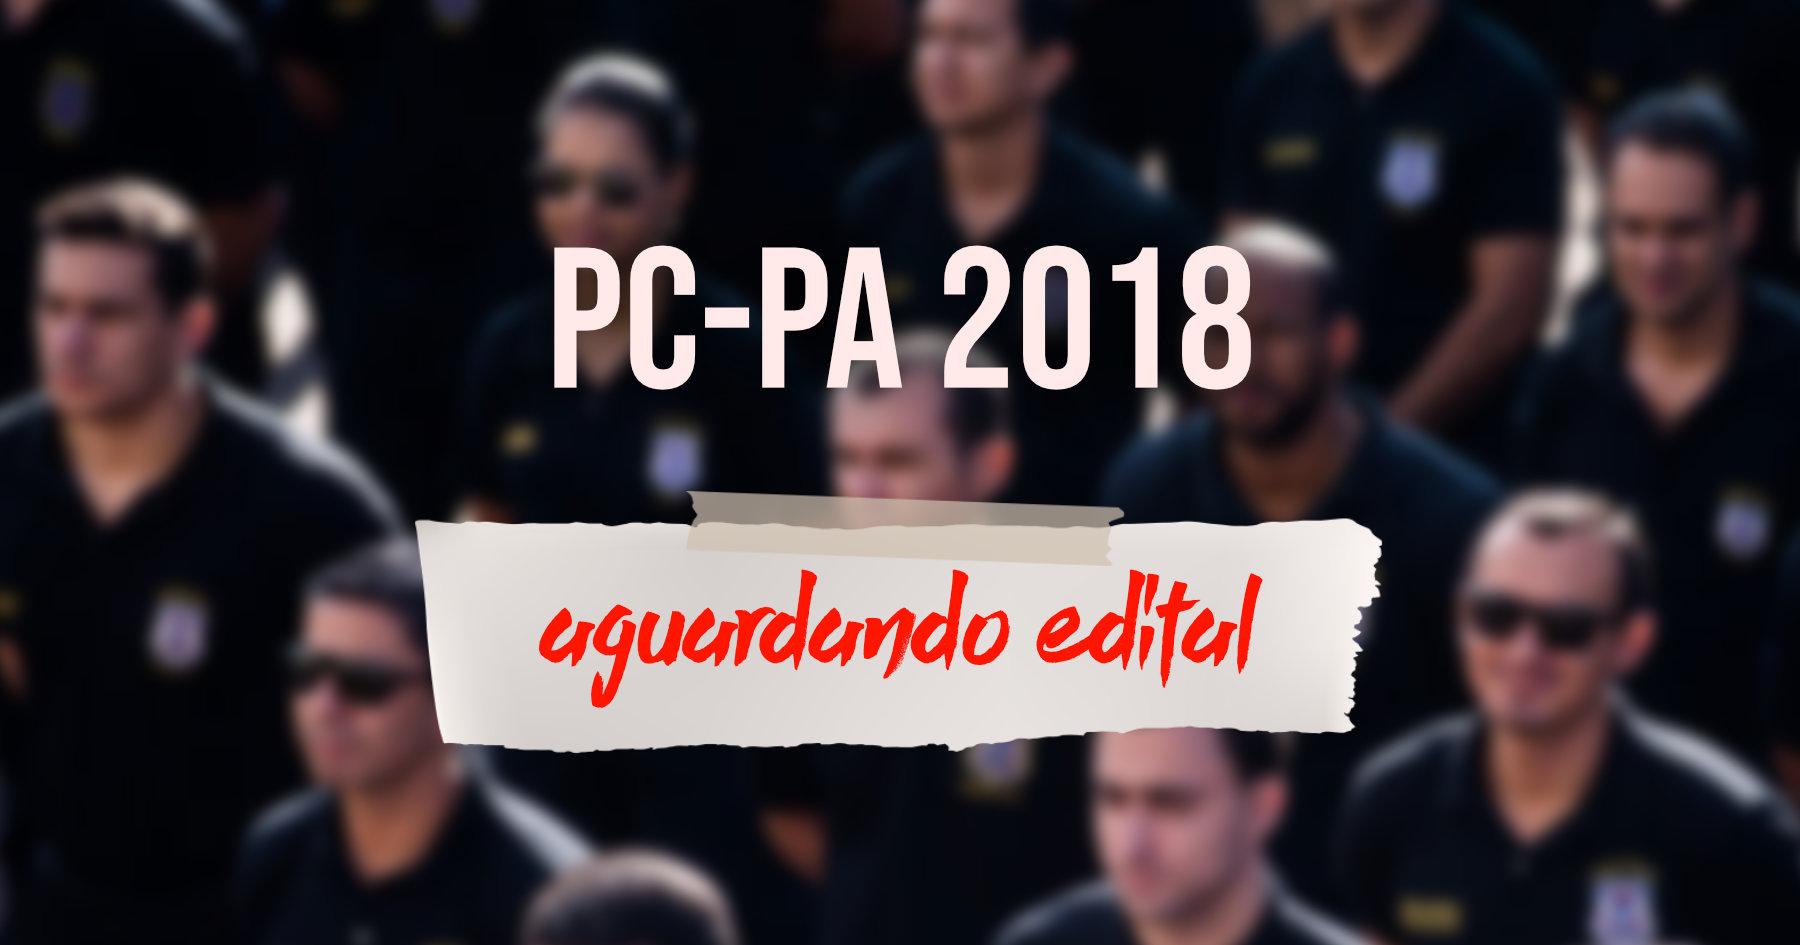 Concurso Polícia Civil PC-PA 2018   AOCP é selecionada para organizar edital